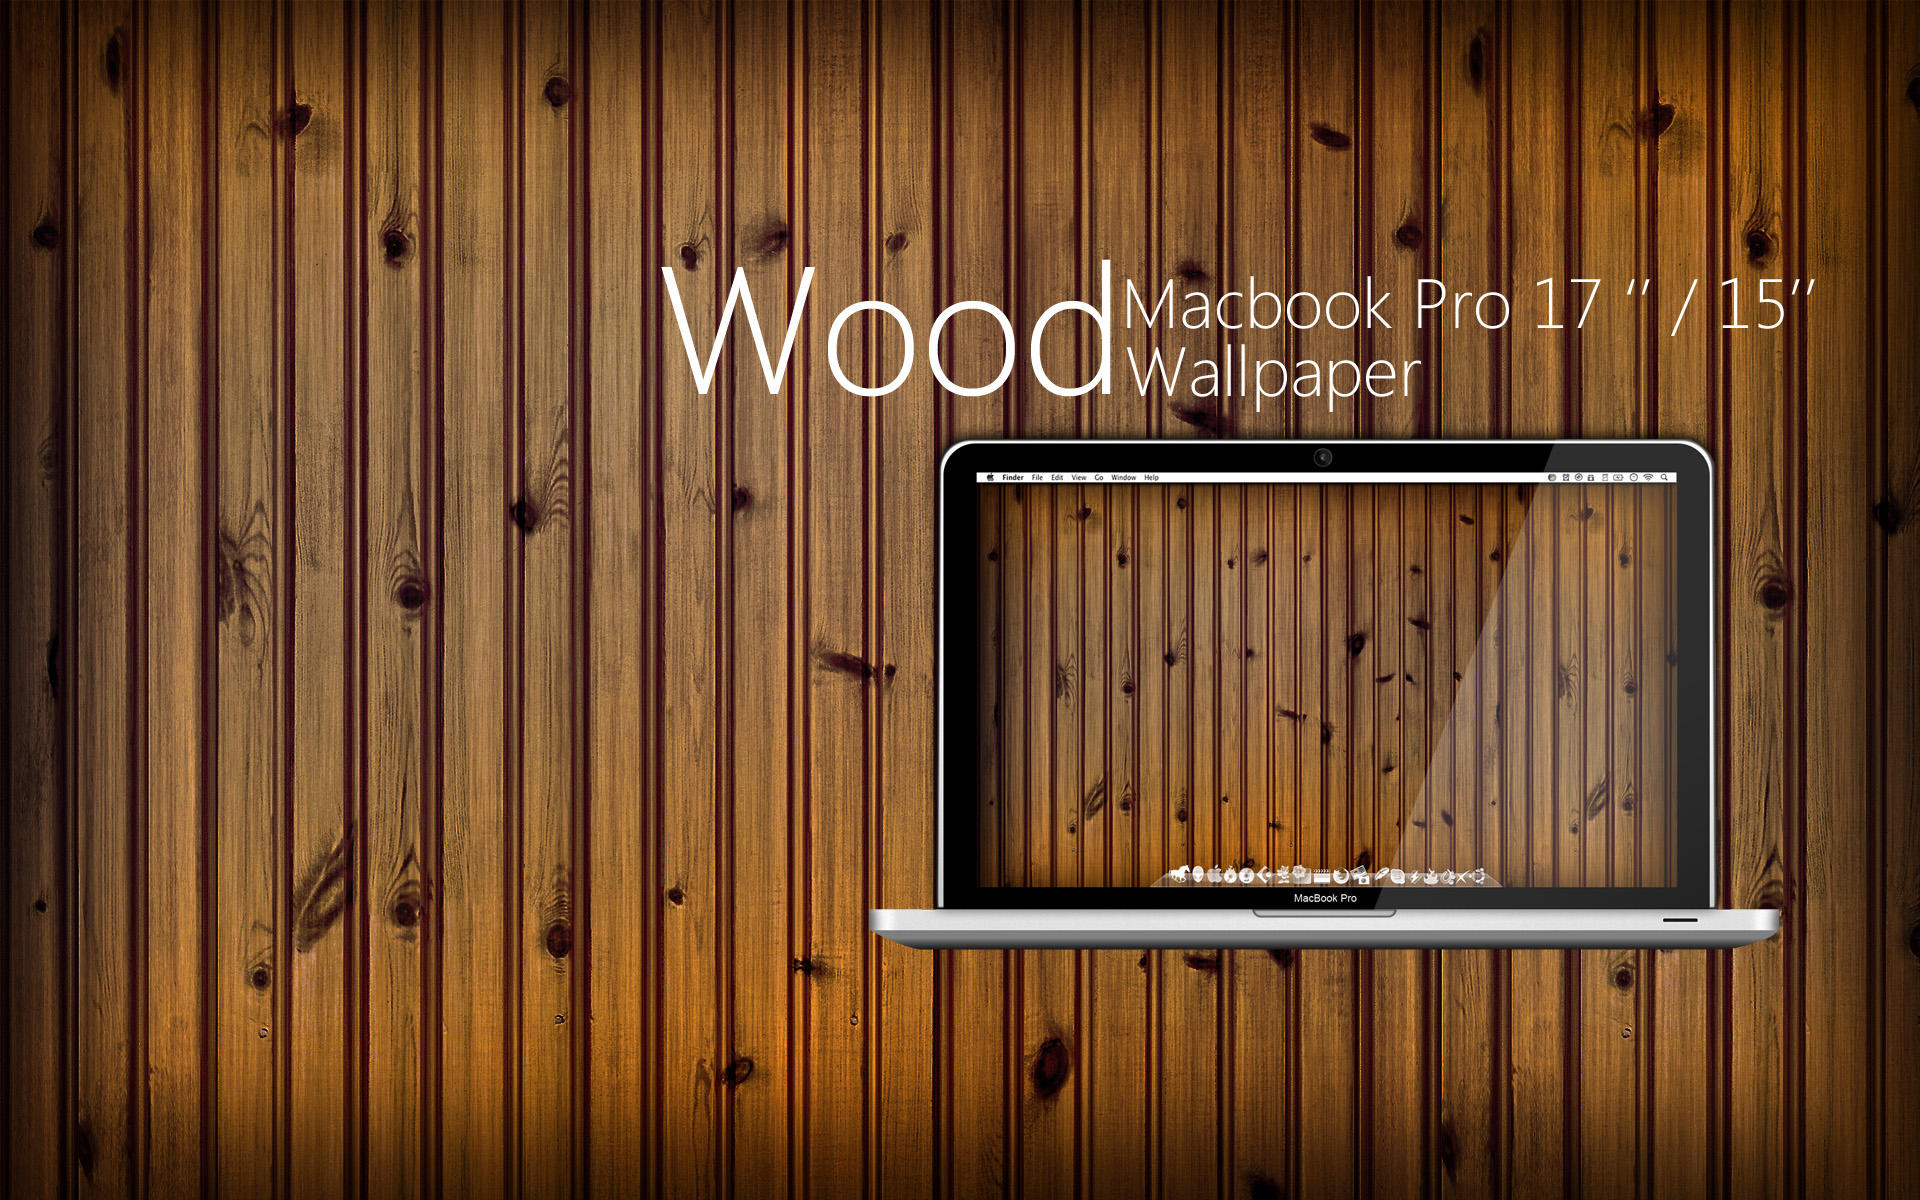 MBP Wood Wallpaper by Martz90 on DeviantArt